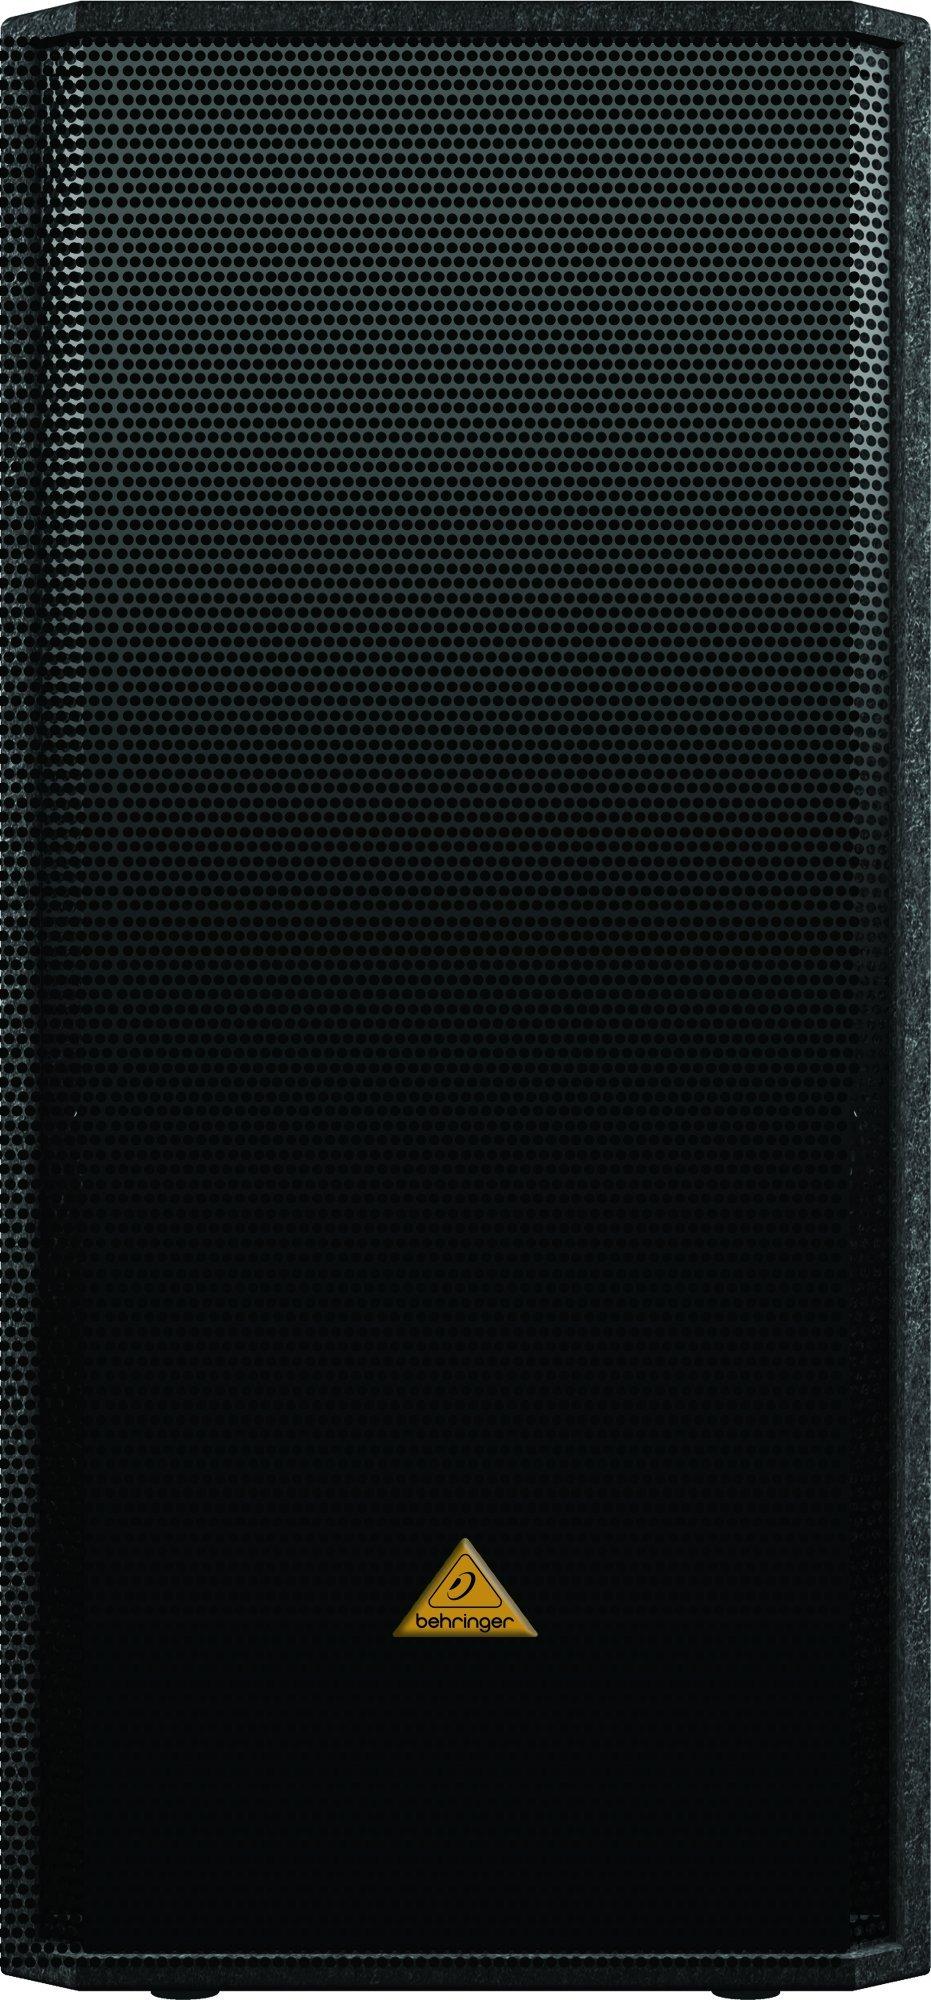 Behringer EUROLIVE Vp2520 Professional 2000-Watt Pa Speaker with Dual 15 Woofers And 1.75 Titanium-Diaphragm Compression Driver